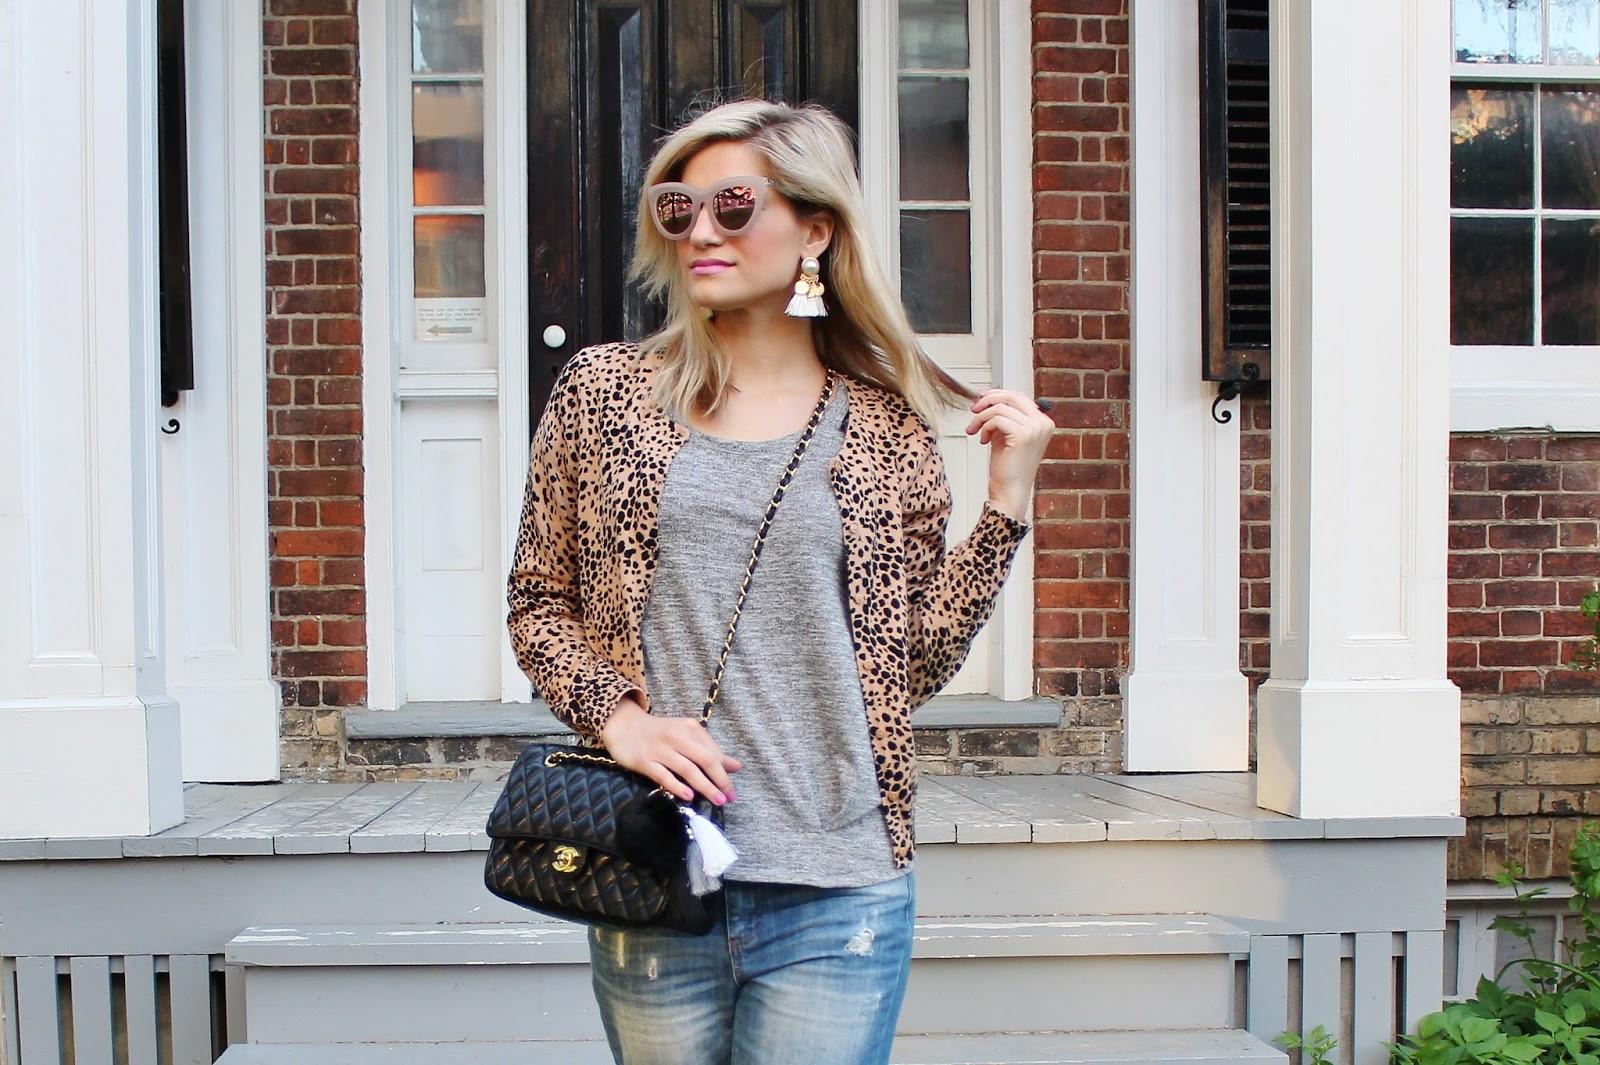 Bijuleni - Streetstyle ootd leopard cardi and boyfriend jeans